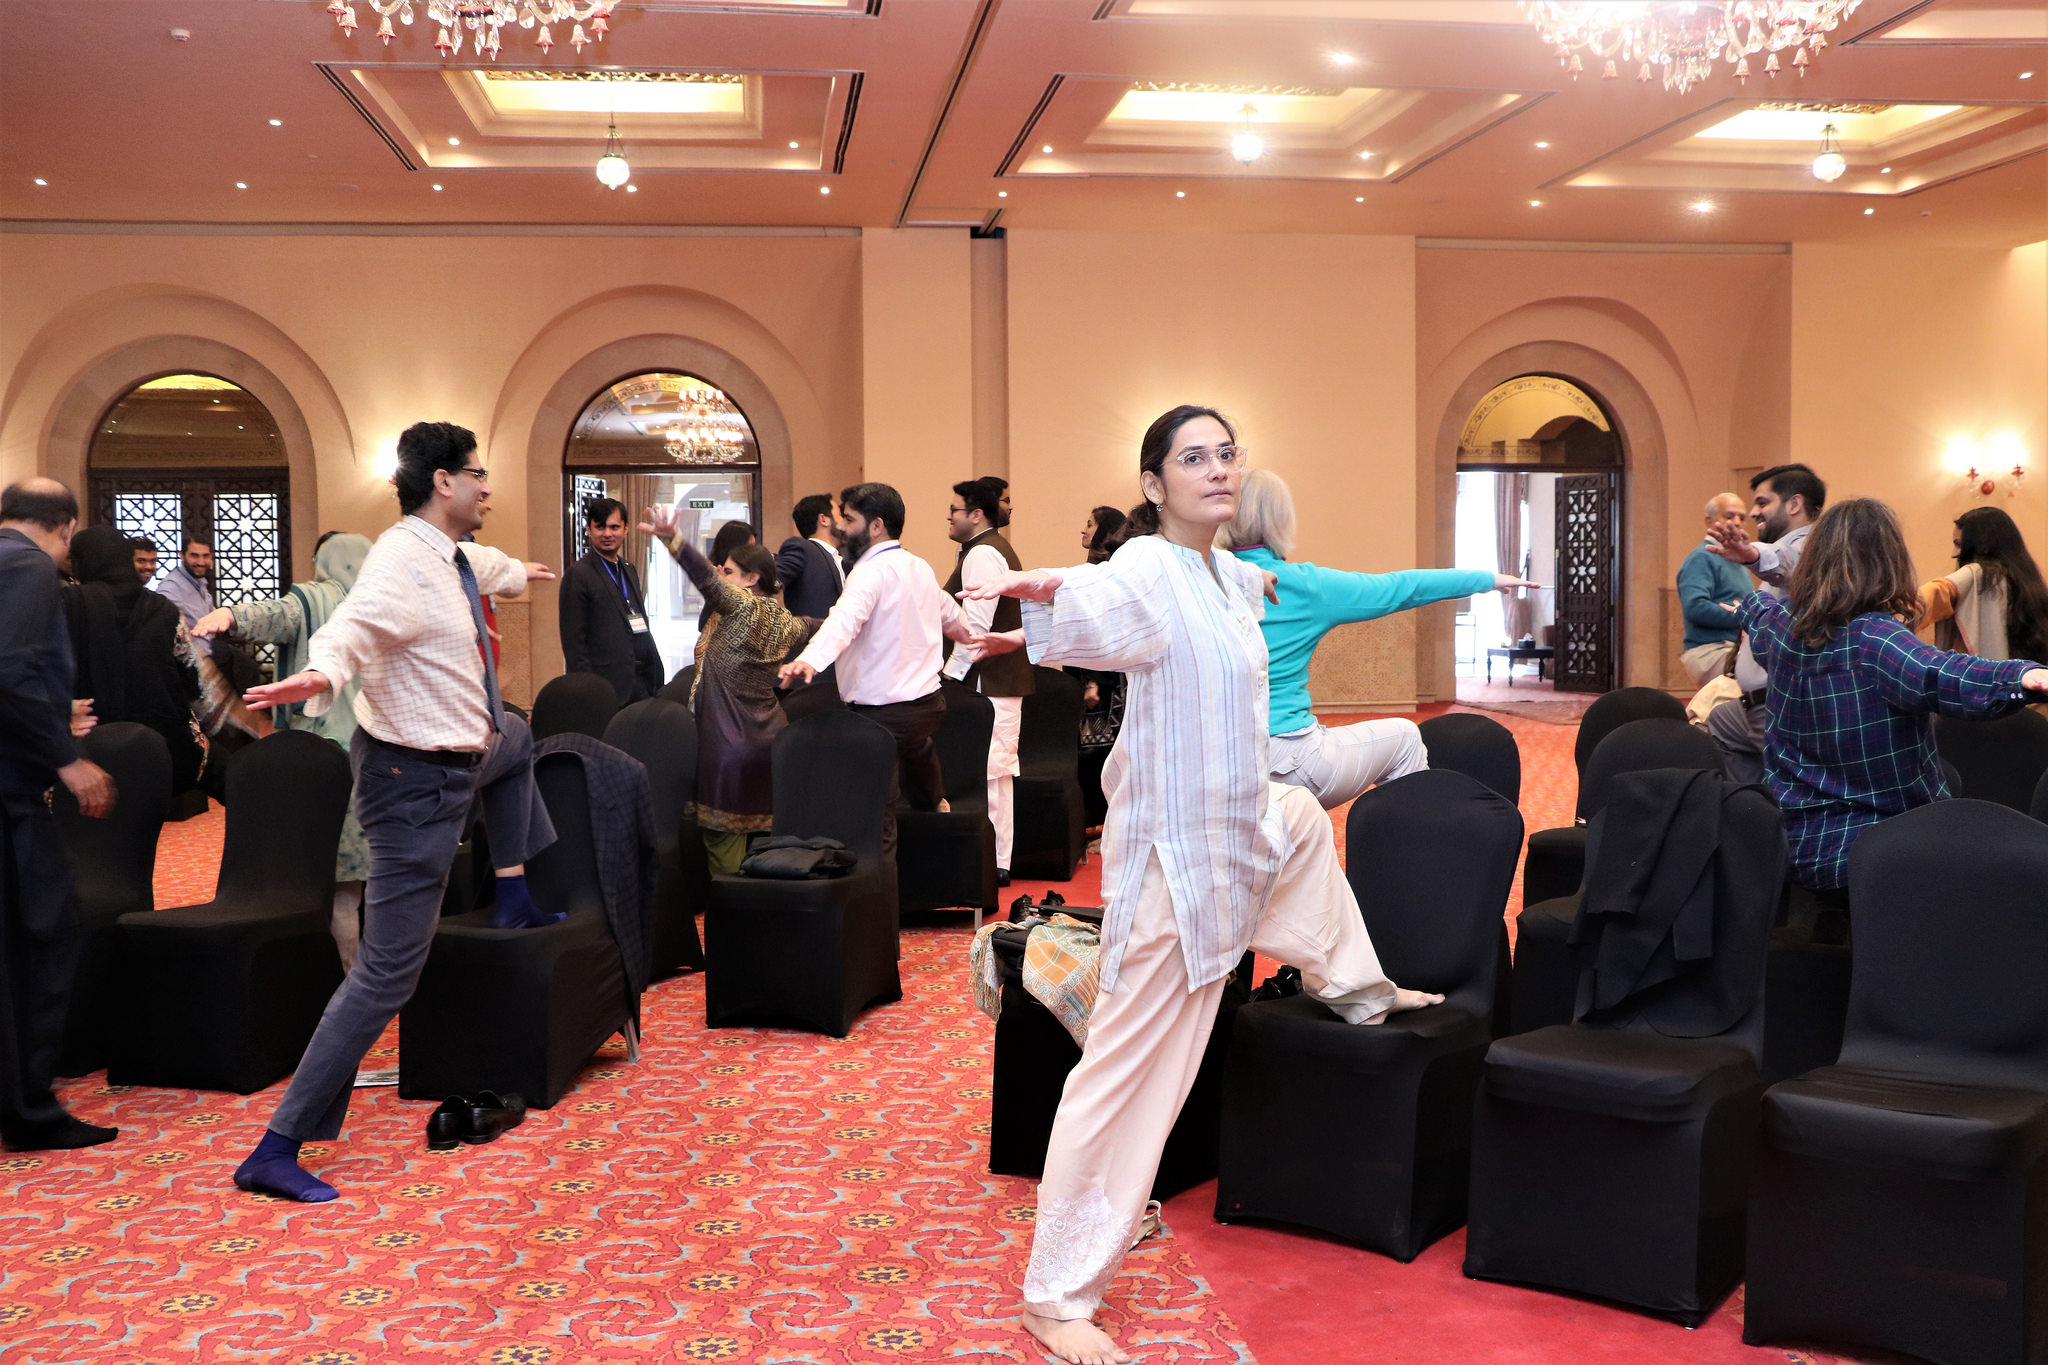 Participants enjoy yoga and meditation in a masterclass by Nadia Akram